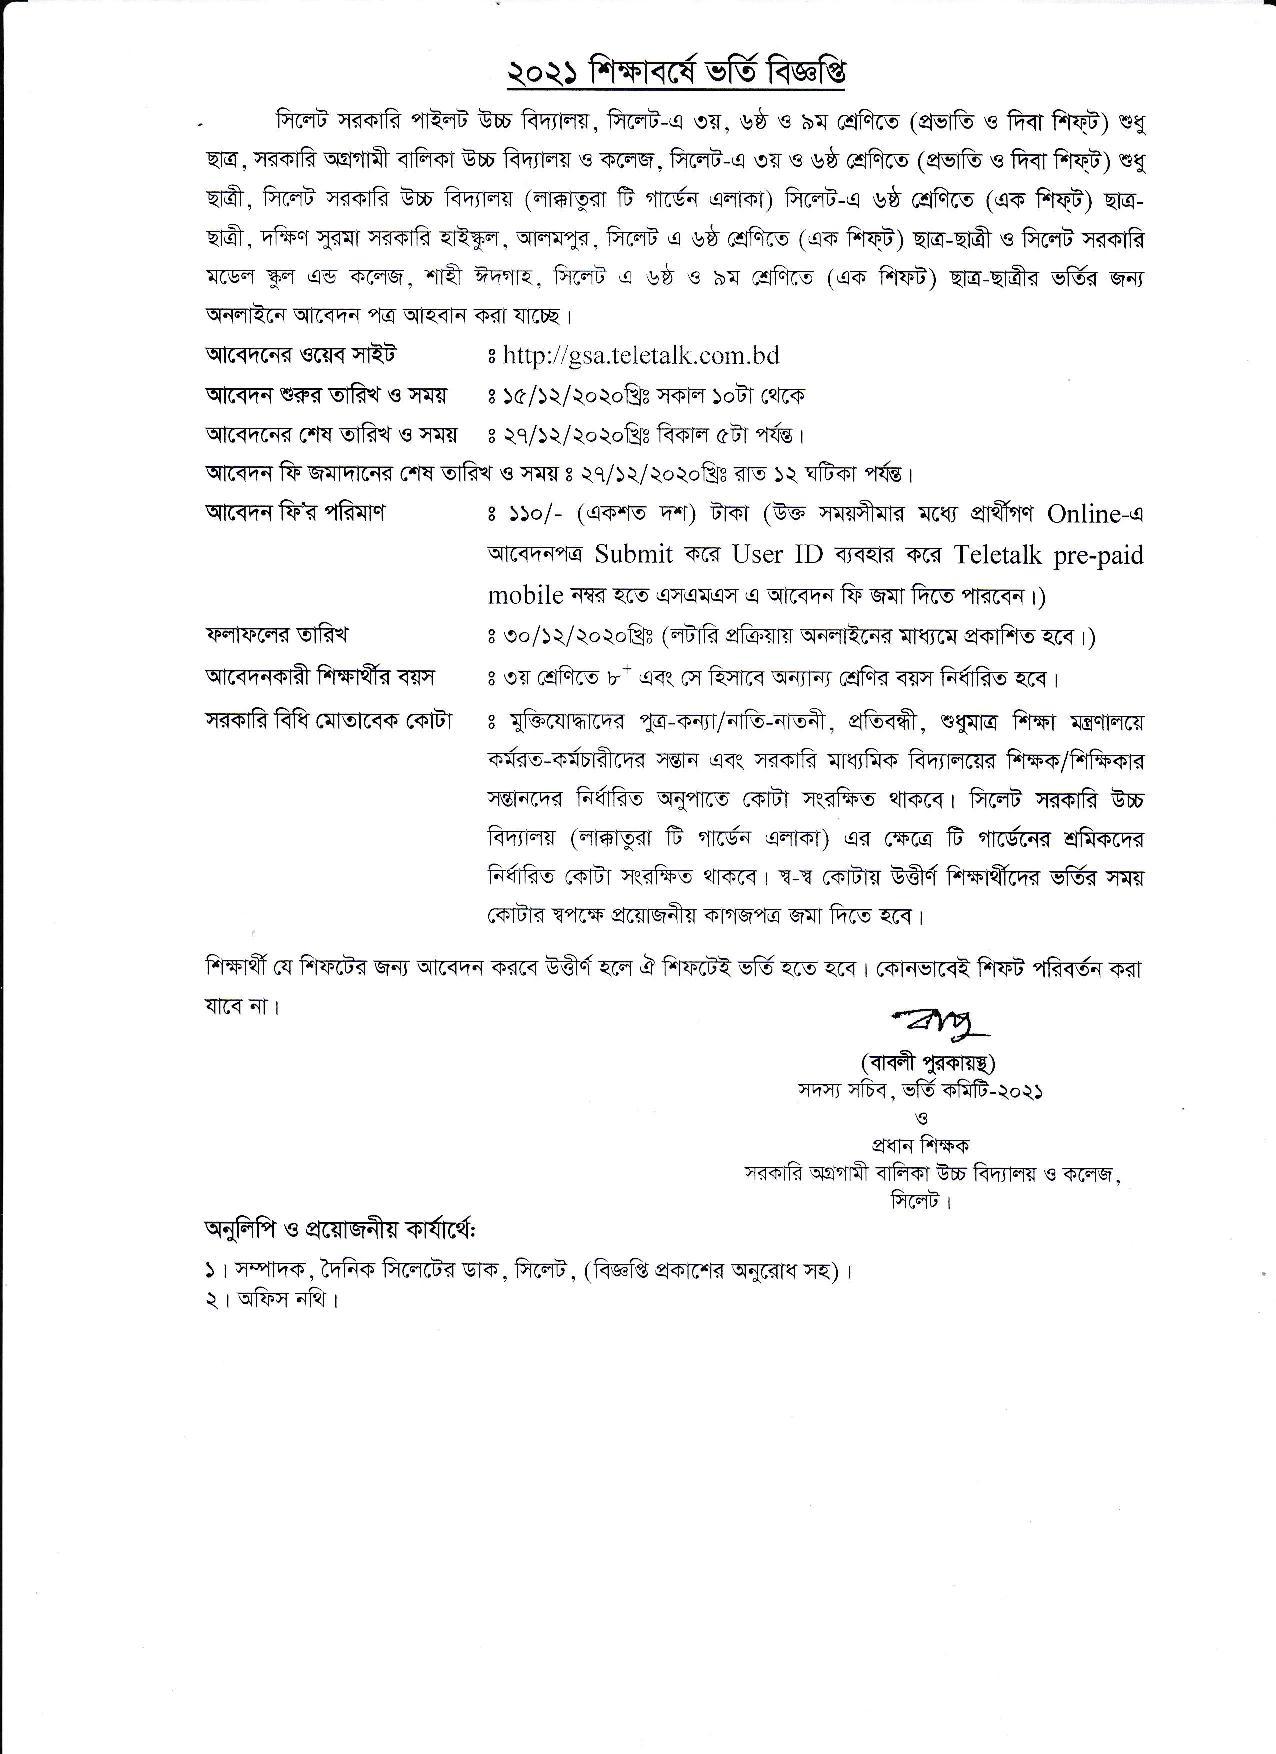 sylhet-admissioin-circular-2021-page-001